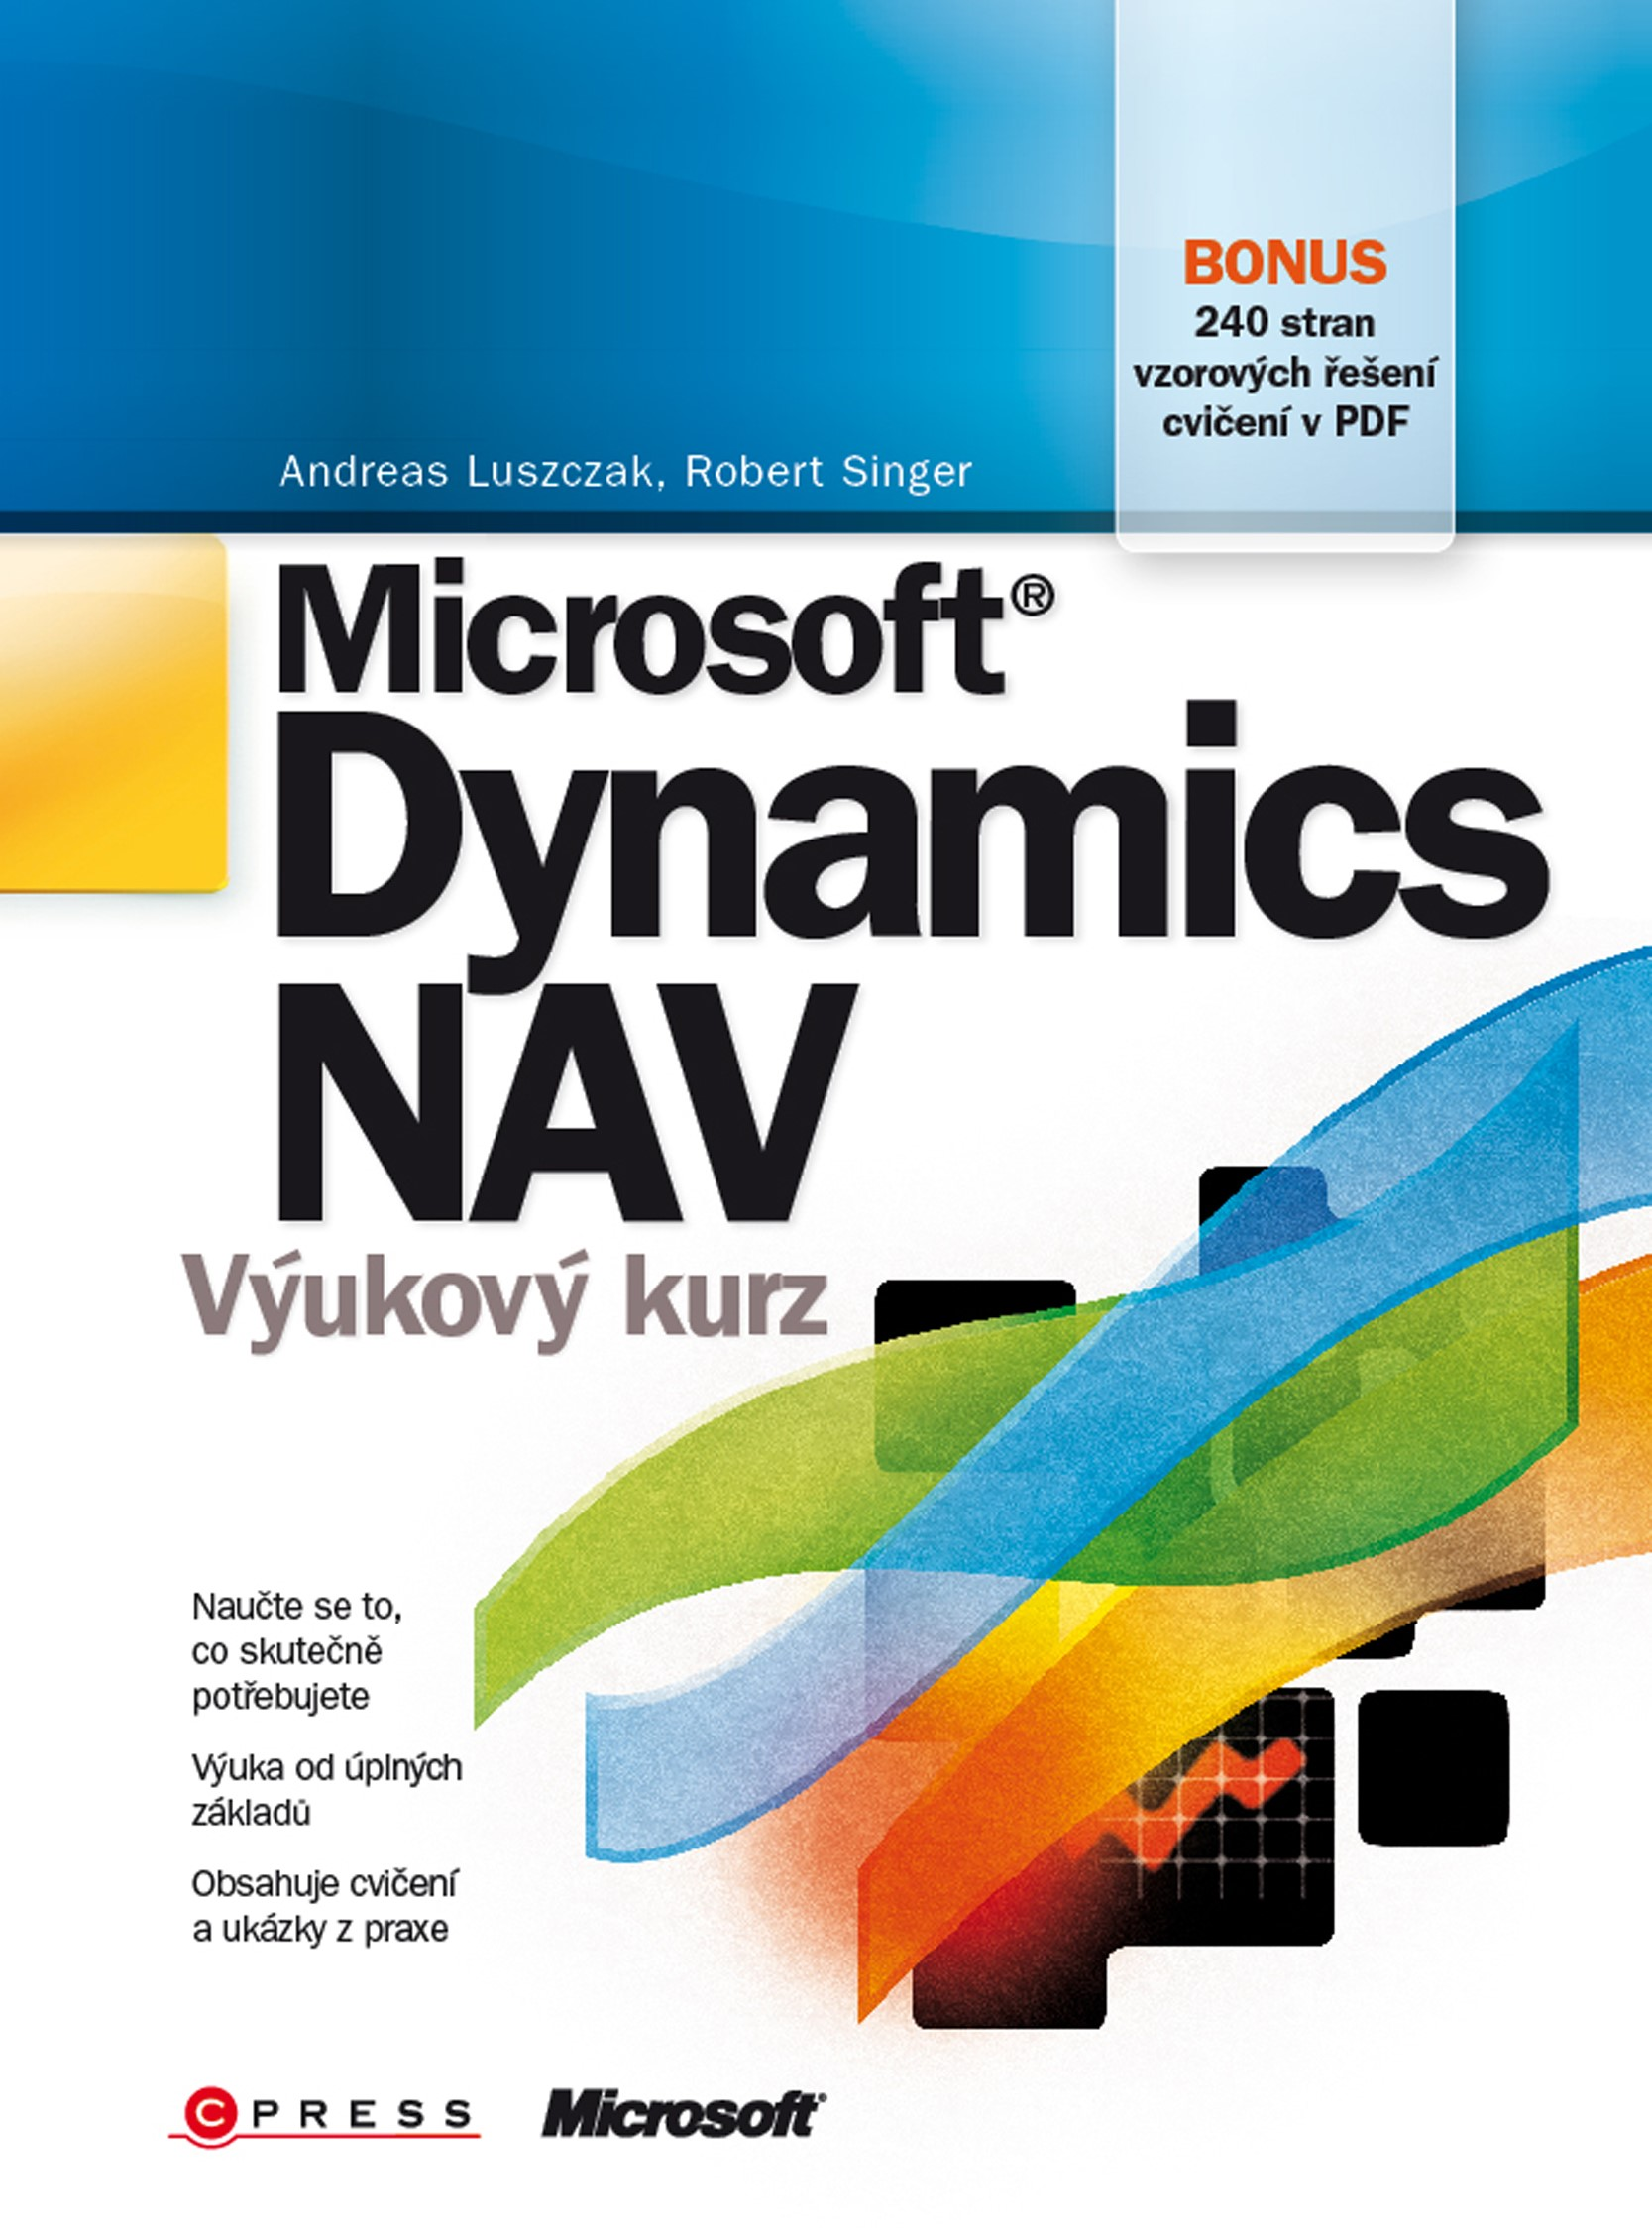 Microsoft Dynamics NAV | Andreas Luszczak, Robert Singer